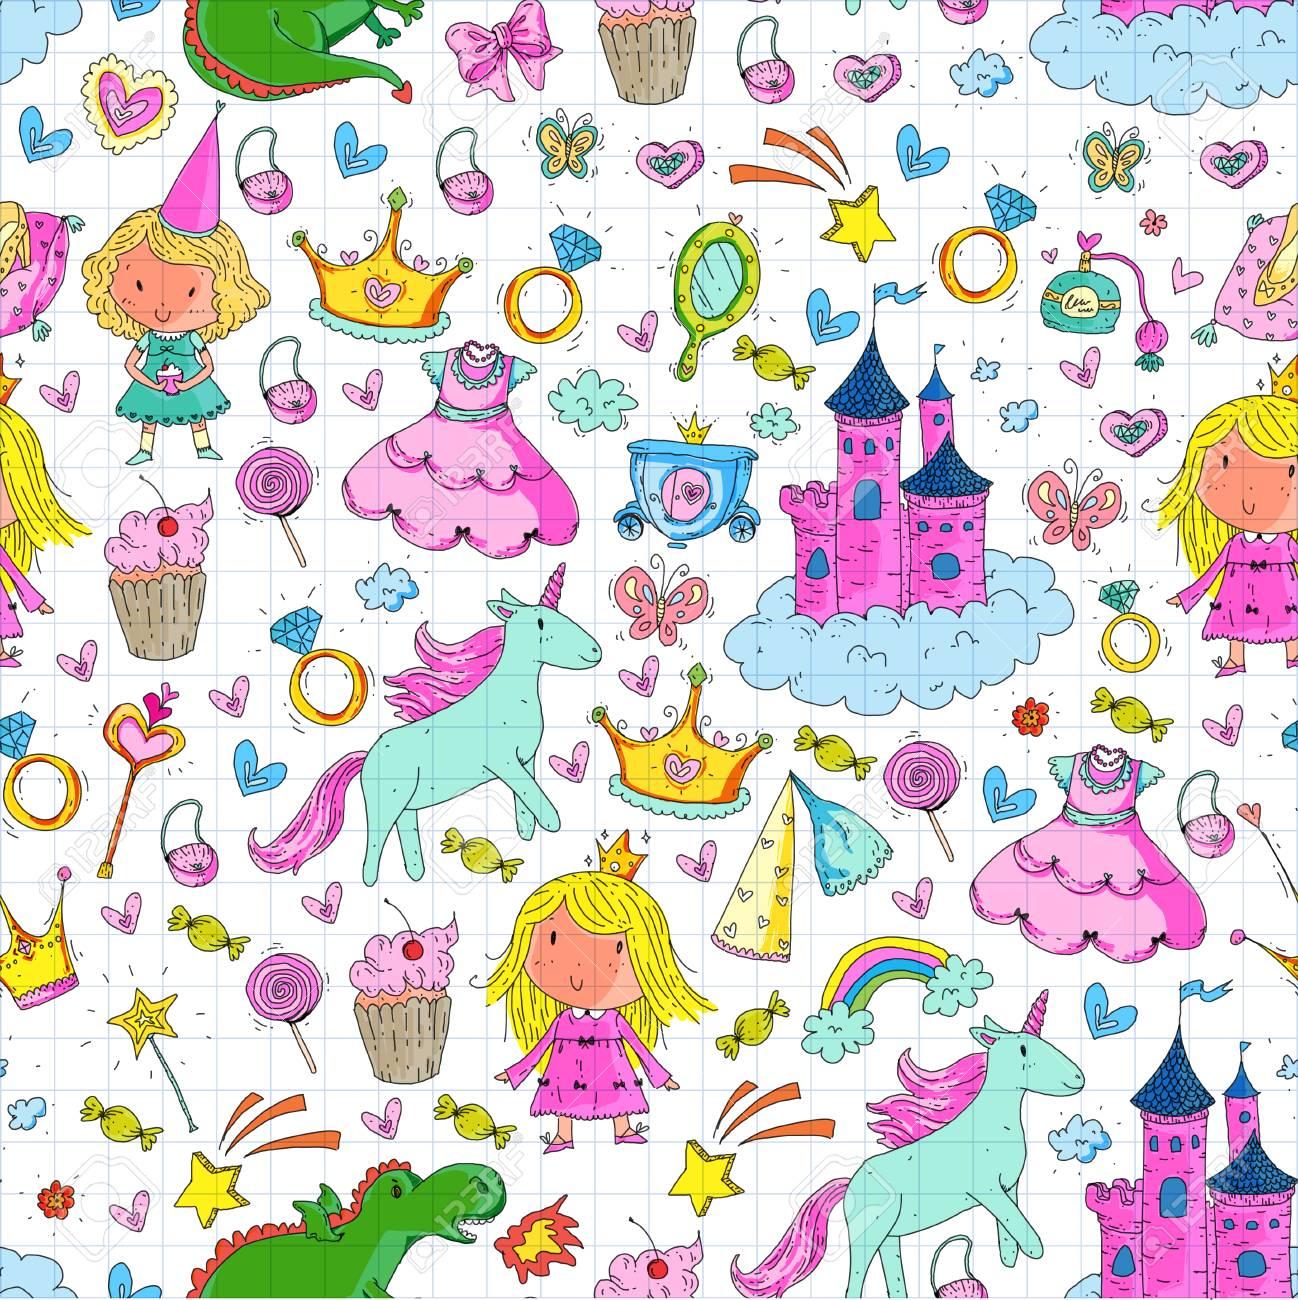 Cute Princess Icons Set With Unicorn Dragon Girl Wallpaper Baby 1298x1300